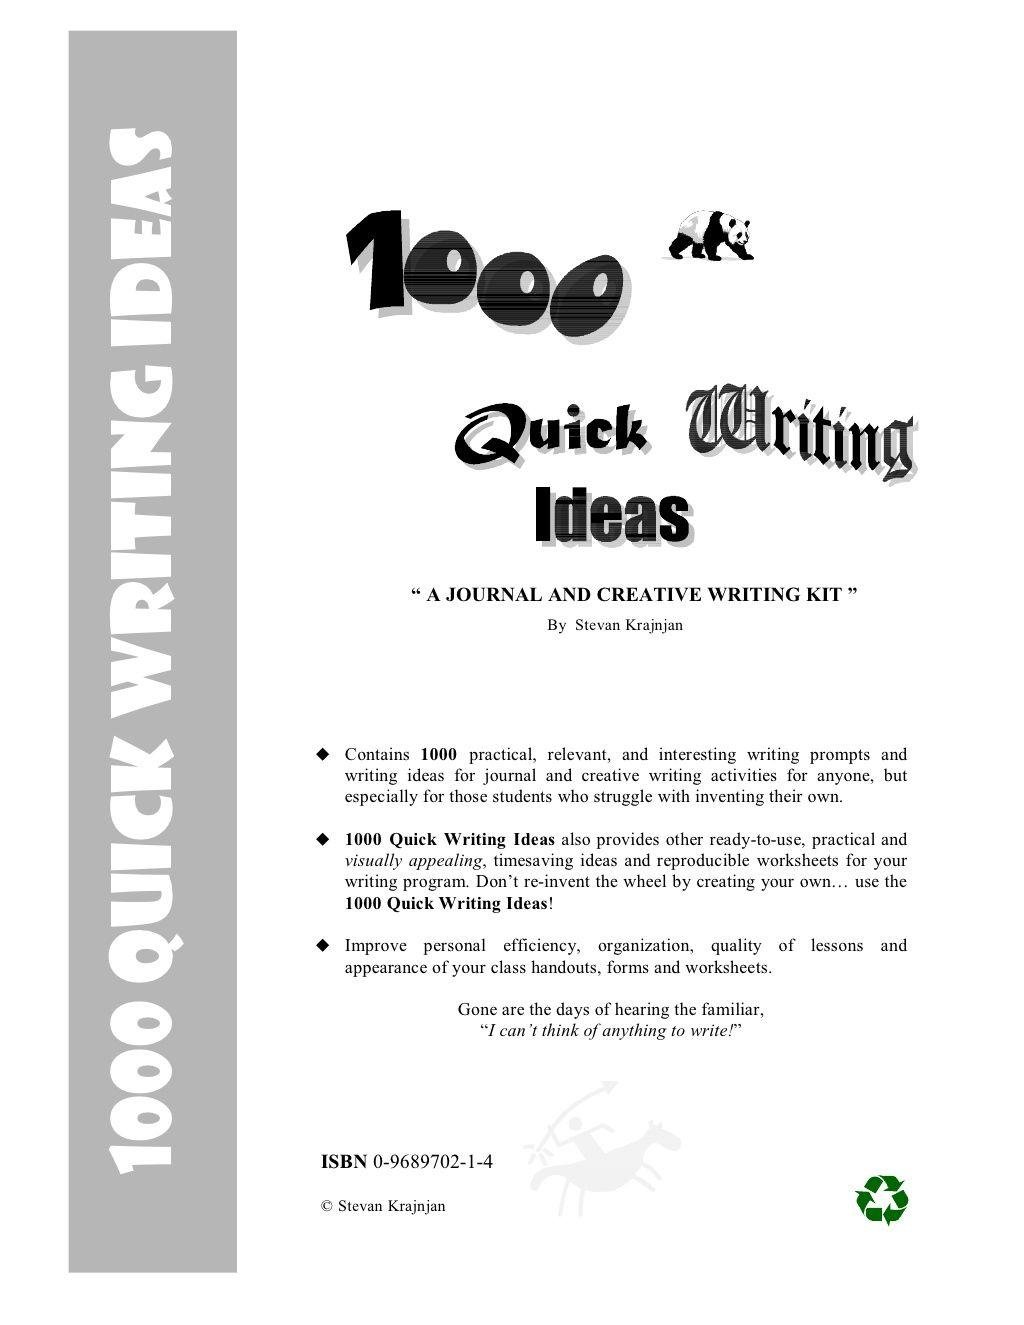 Quick Writing Ideas